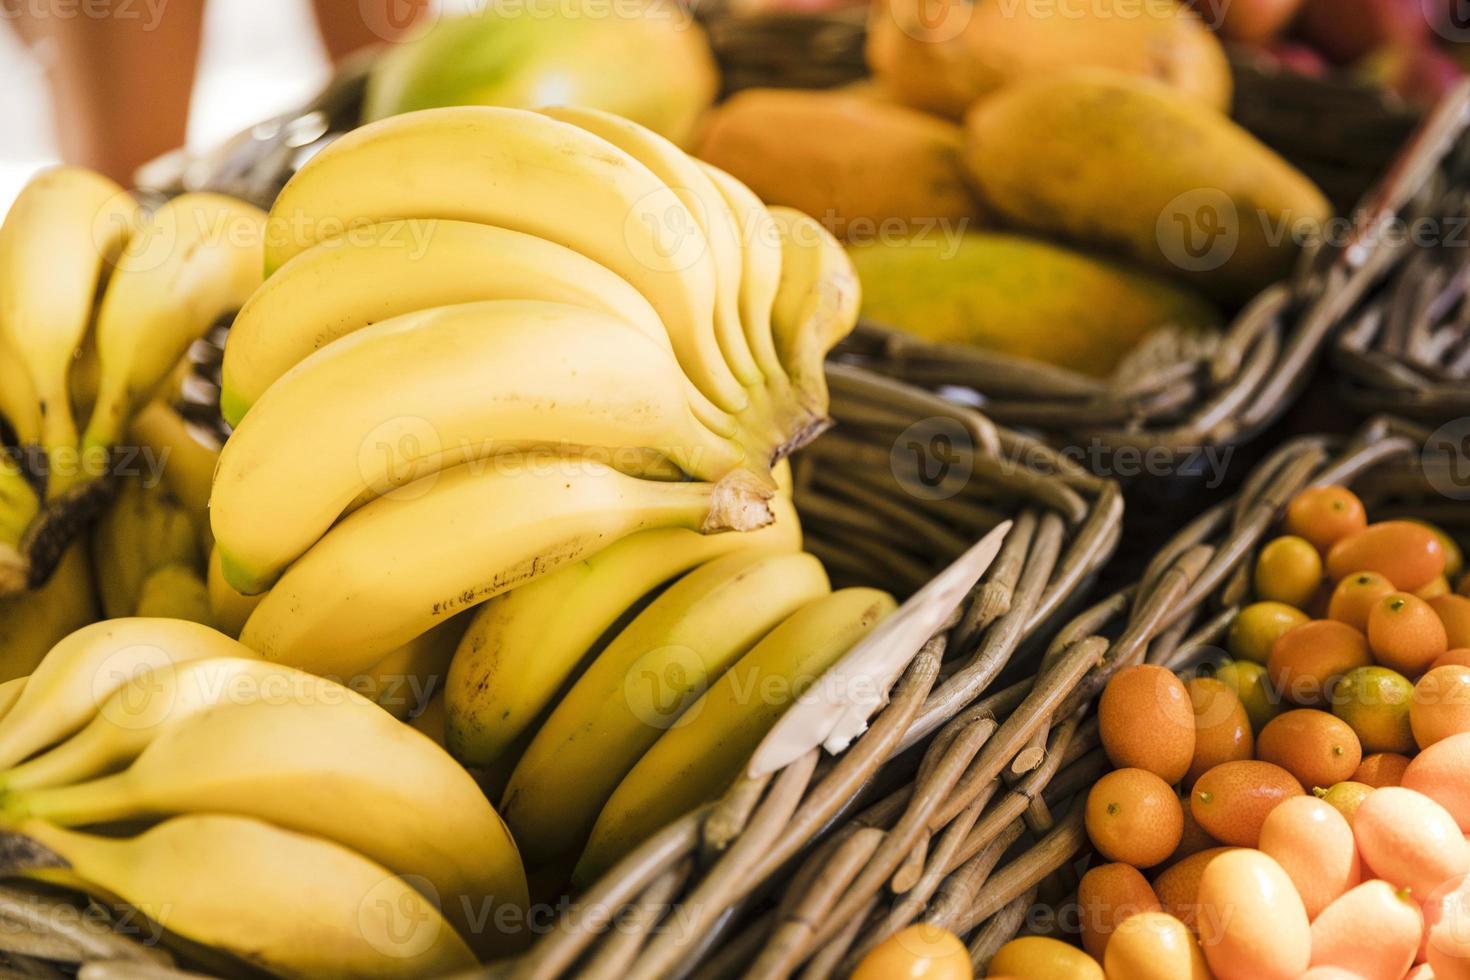 banane fresche e sane al mercato di strada foto